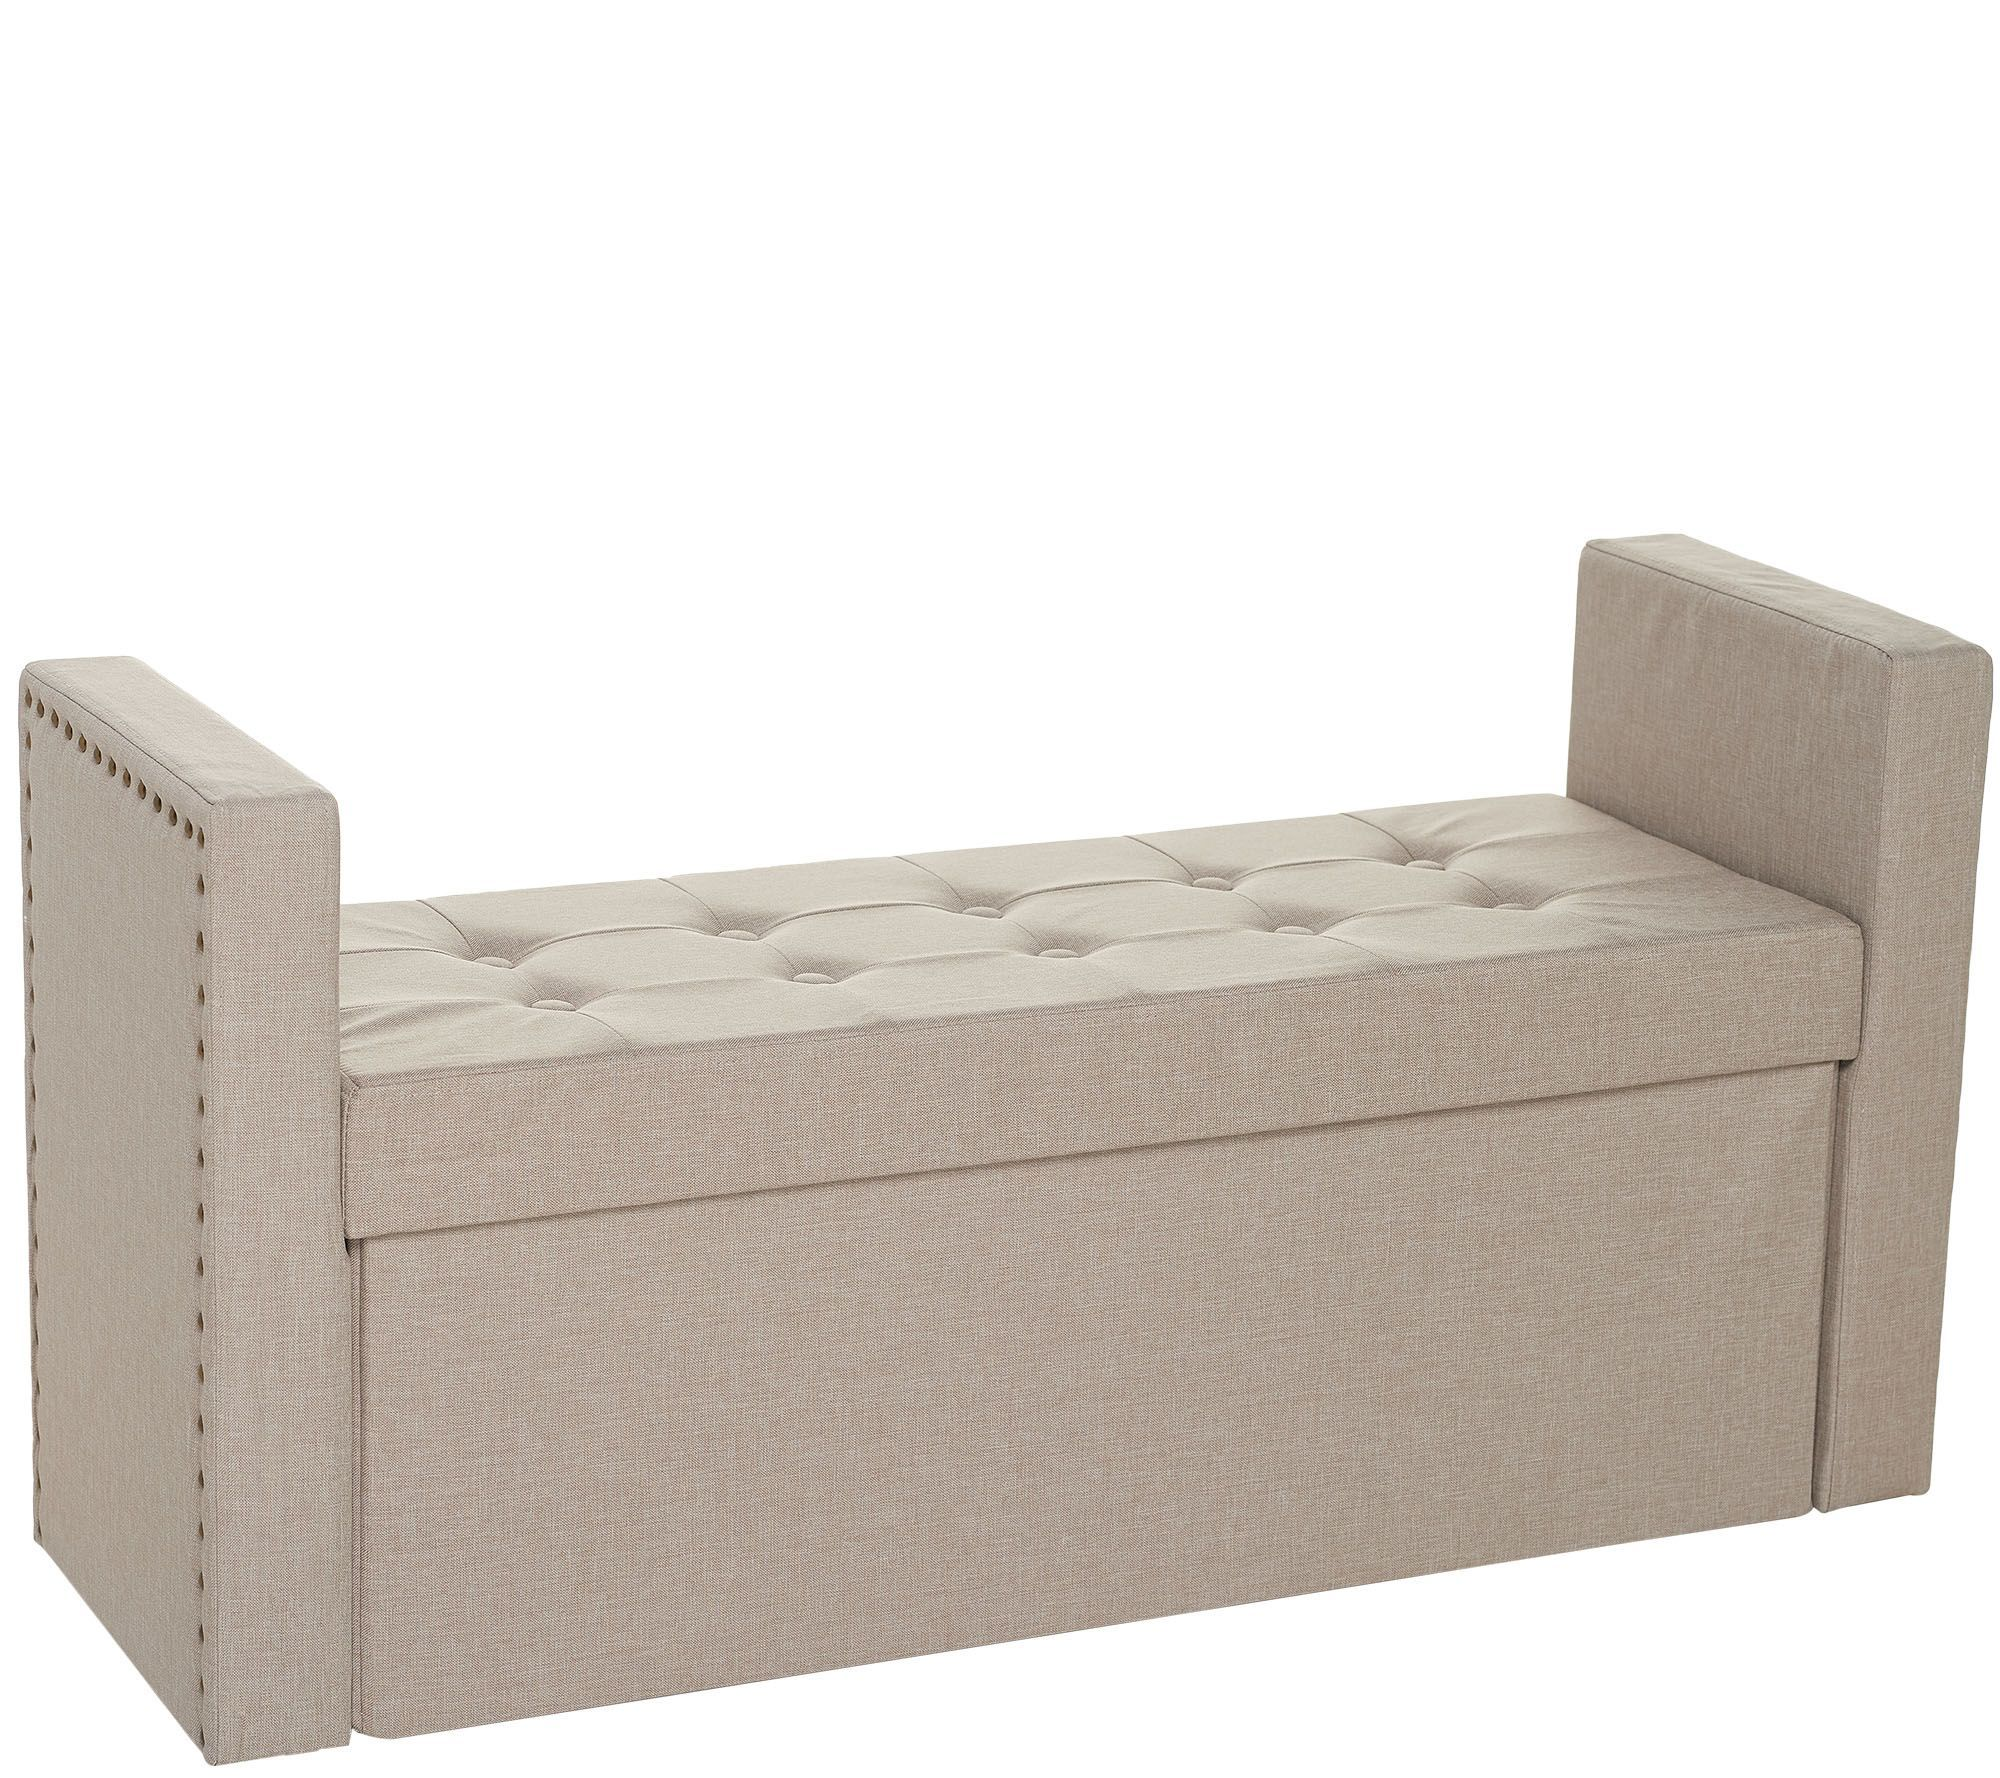 Remarkable Inspire Me Home Decor 45 Collapsible Storage Bench With Inzonedesignstudio Interior Chair Design Inzonedesignstudiocom